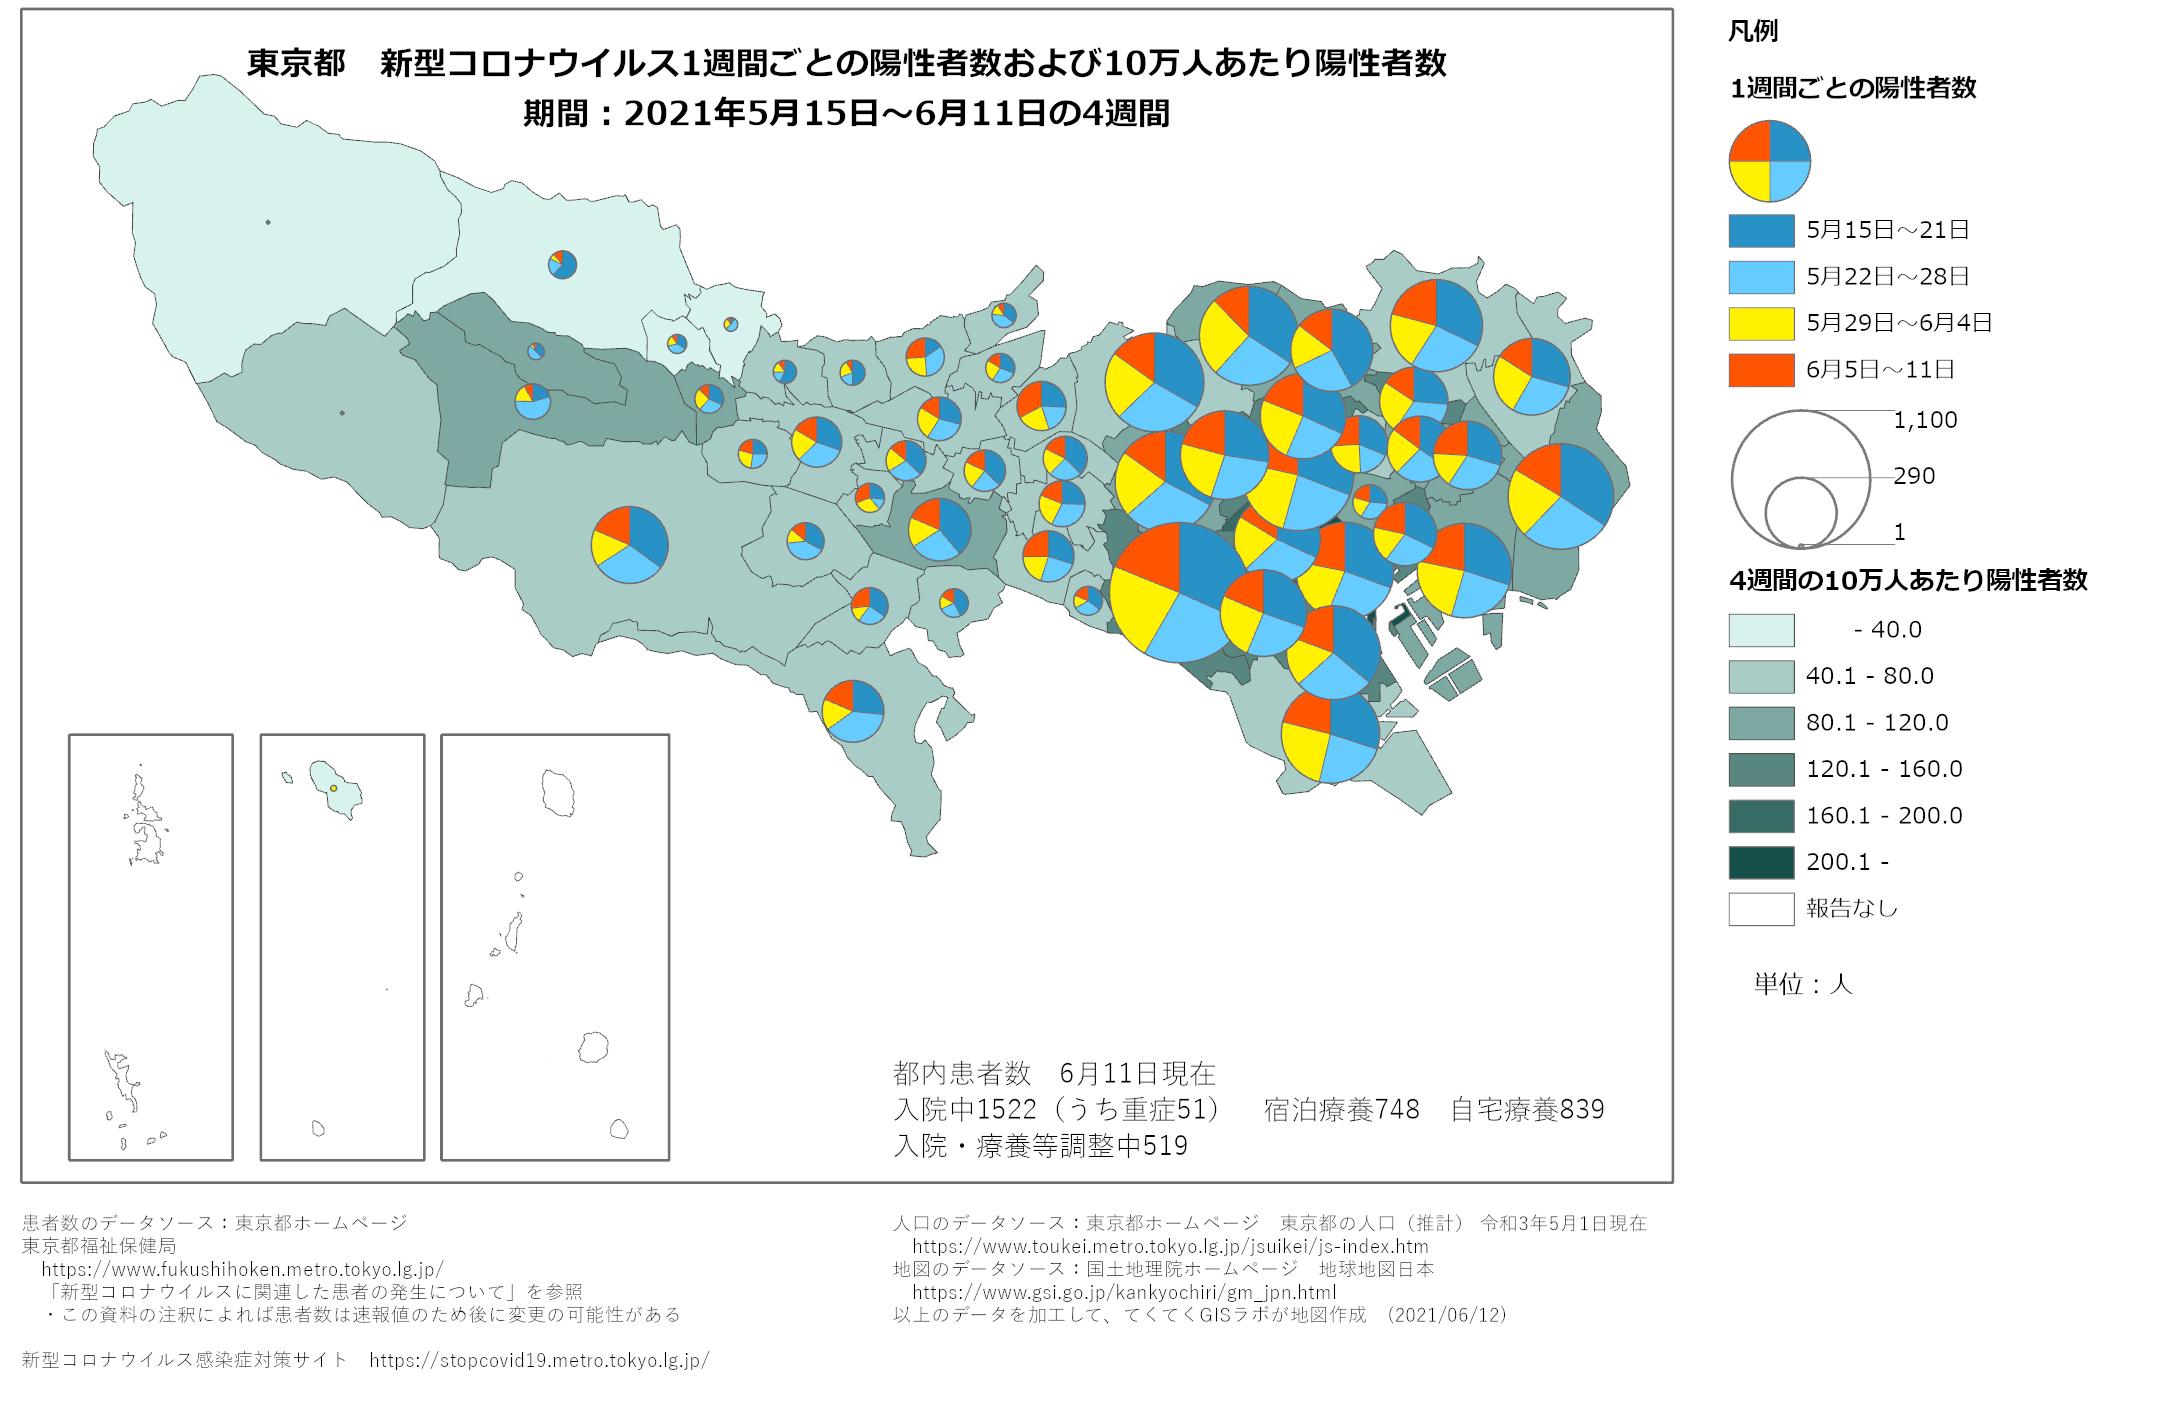 1週間ごと感染者数、東京都、5月15日〜6月11日